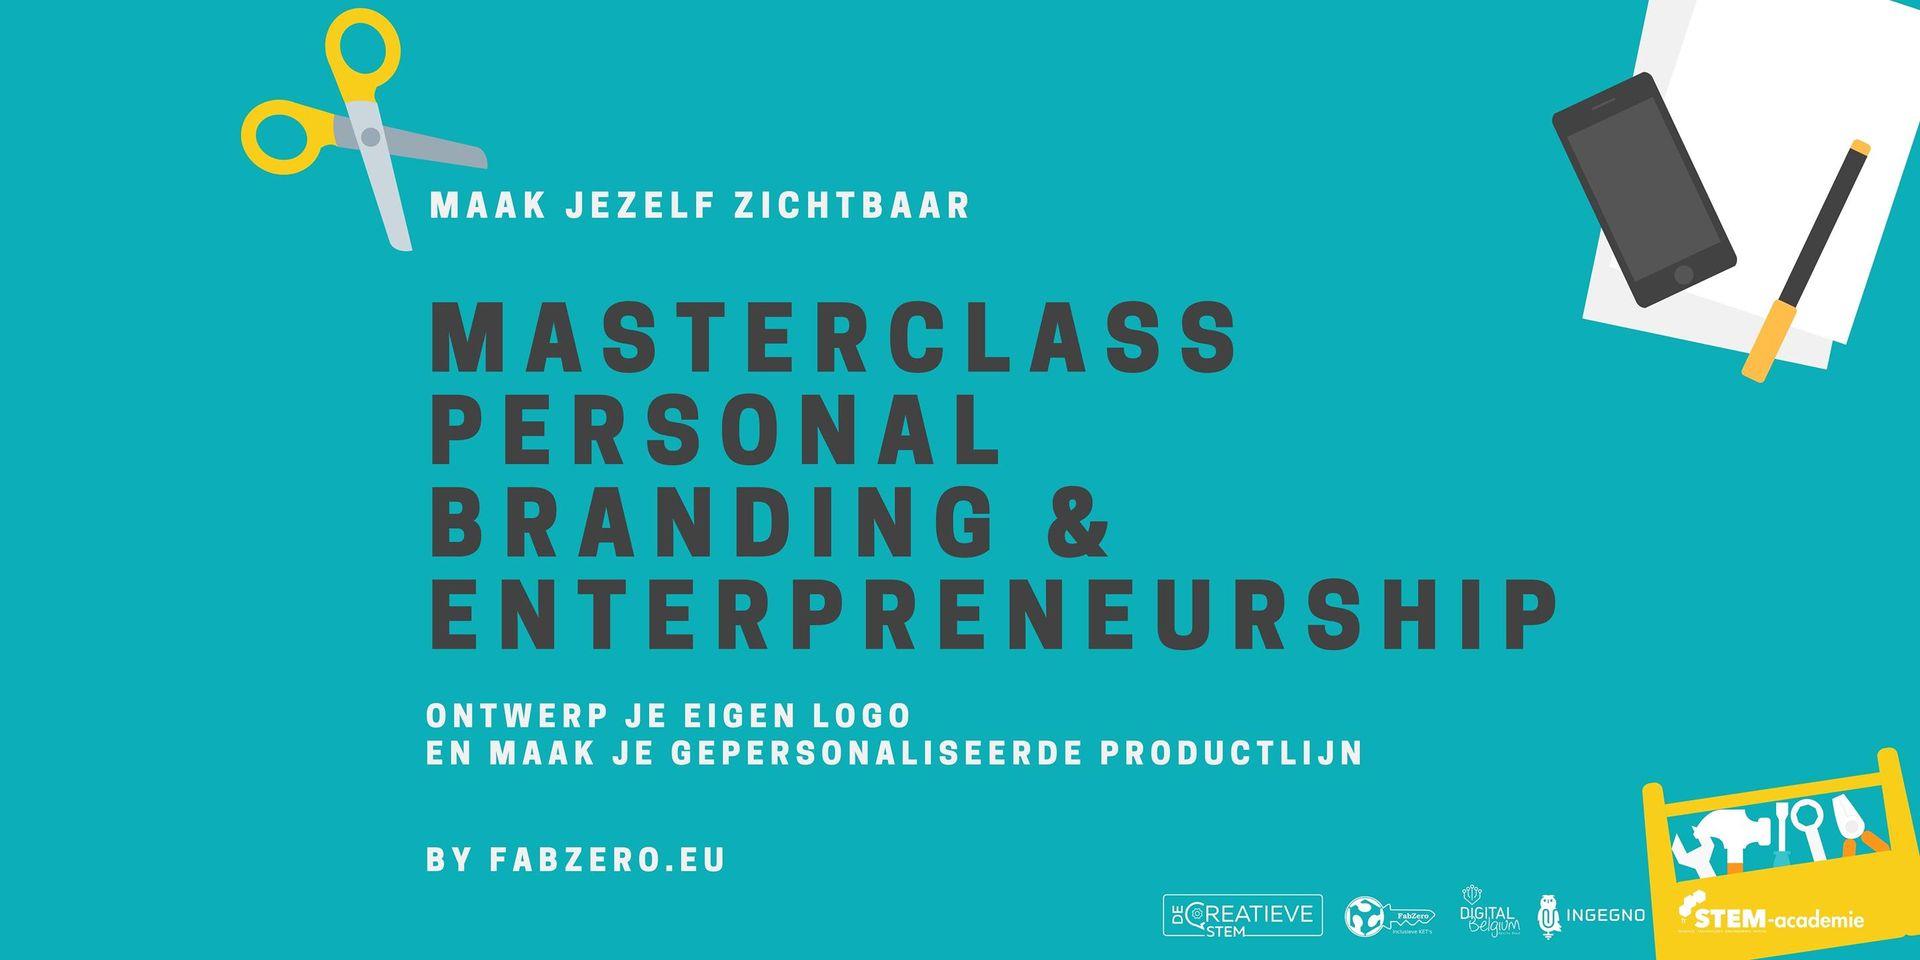 Masterclass Personal Branding & Entrepreneurship, do, vanaf 7/10